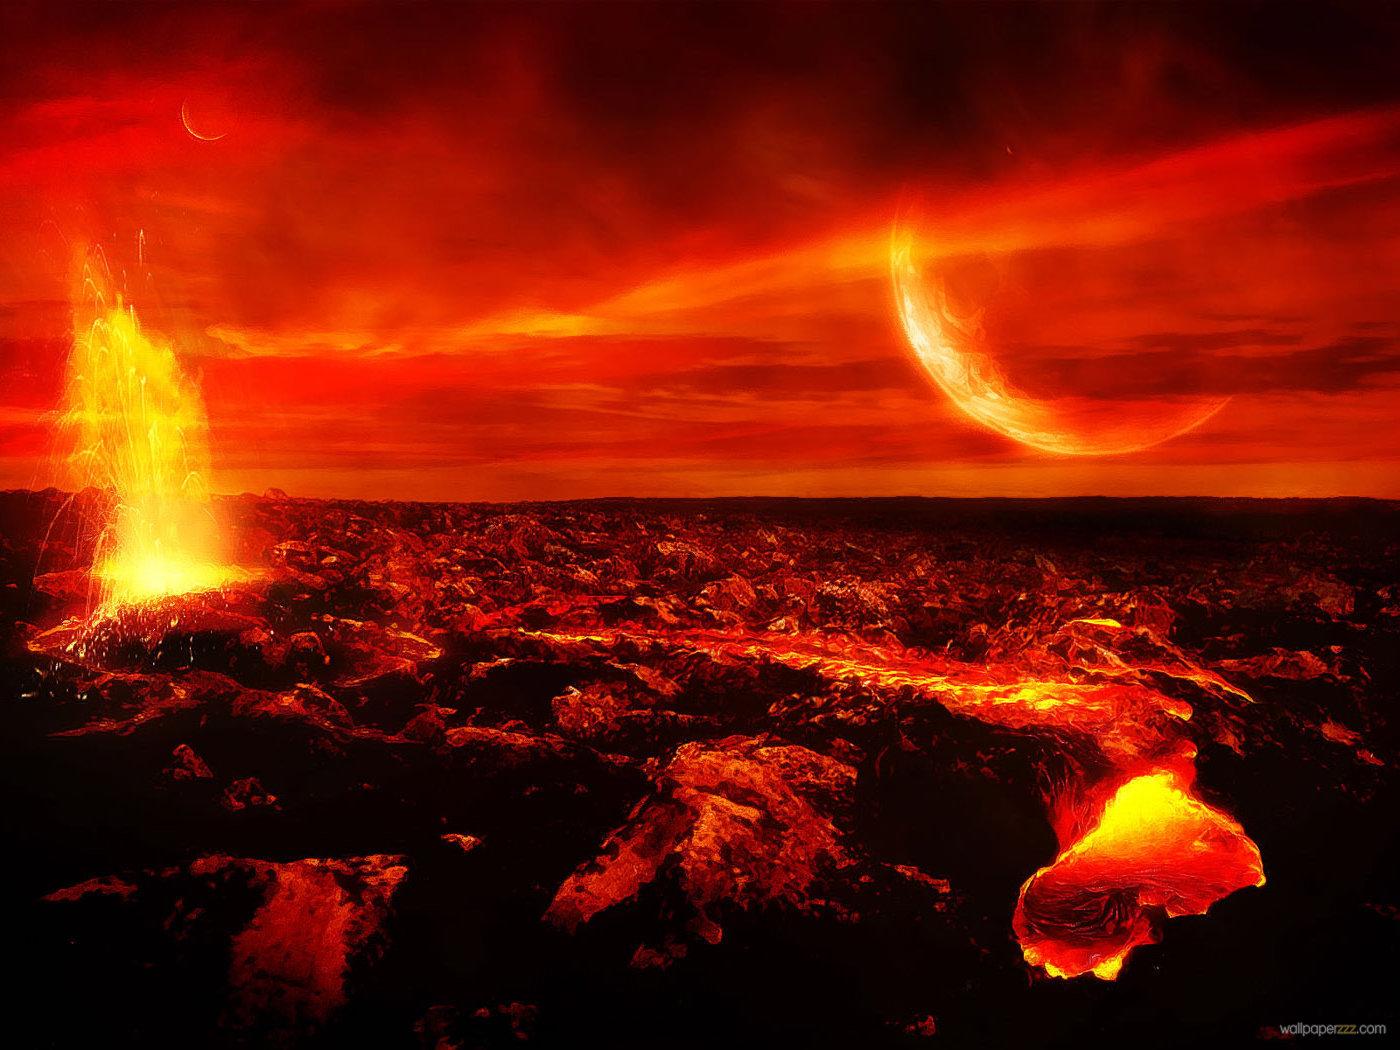 Volcano Image download best HD at digitalimagemakerworldcom 1400x1050